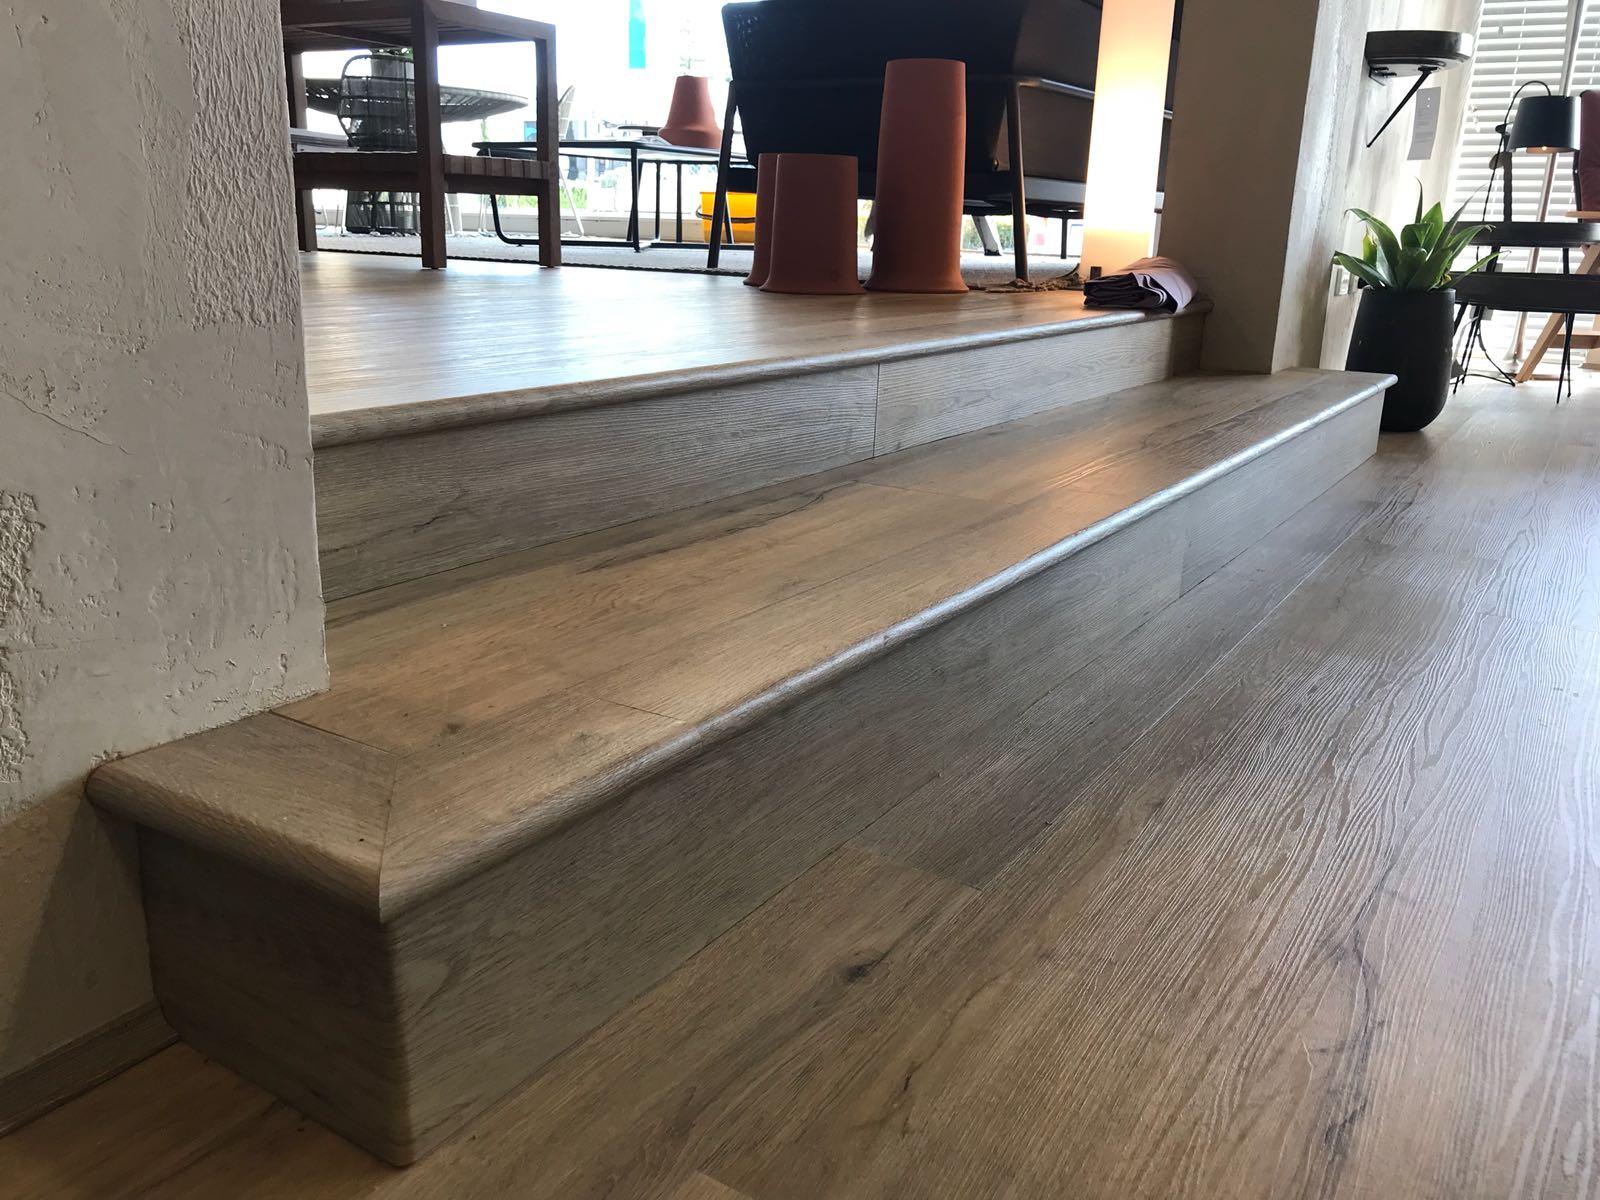 Aspire Hybrid Barn Oak Titan Timber Flooring